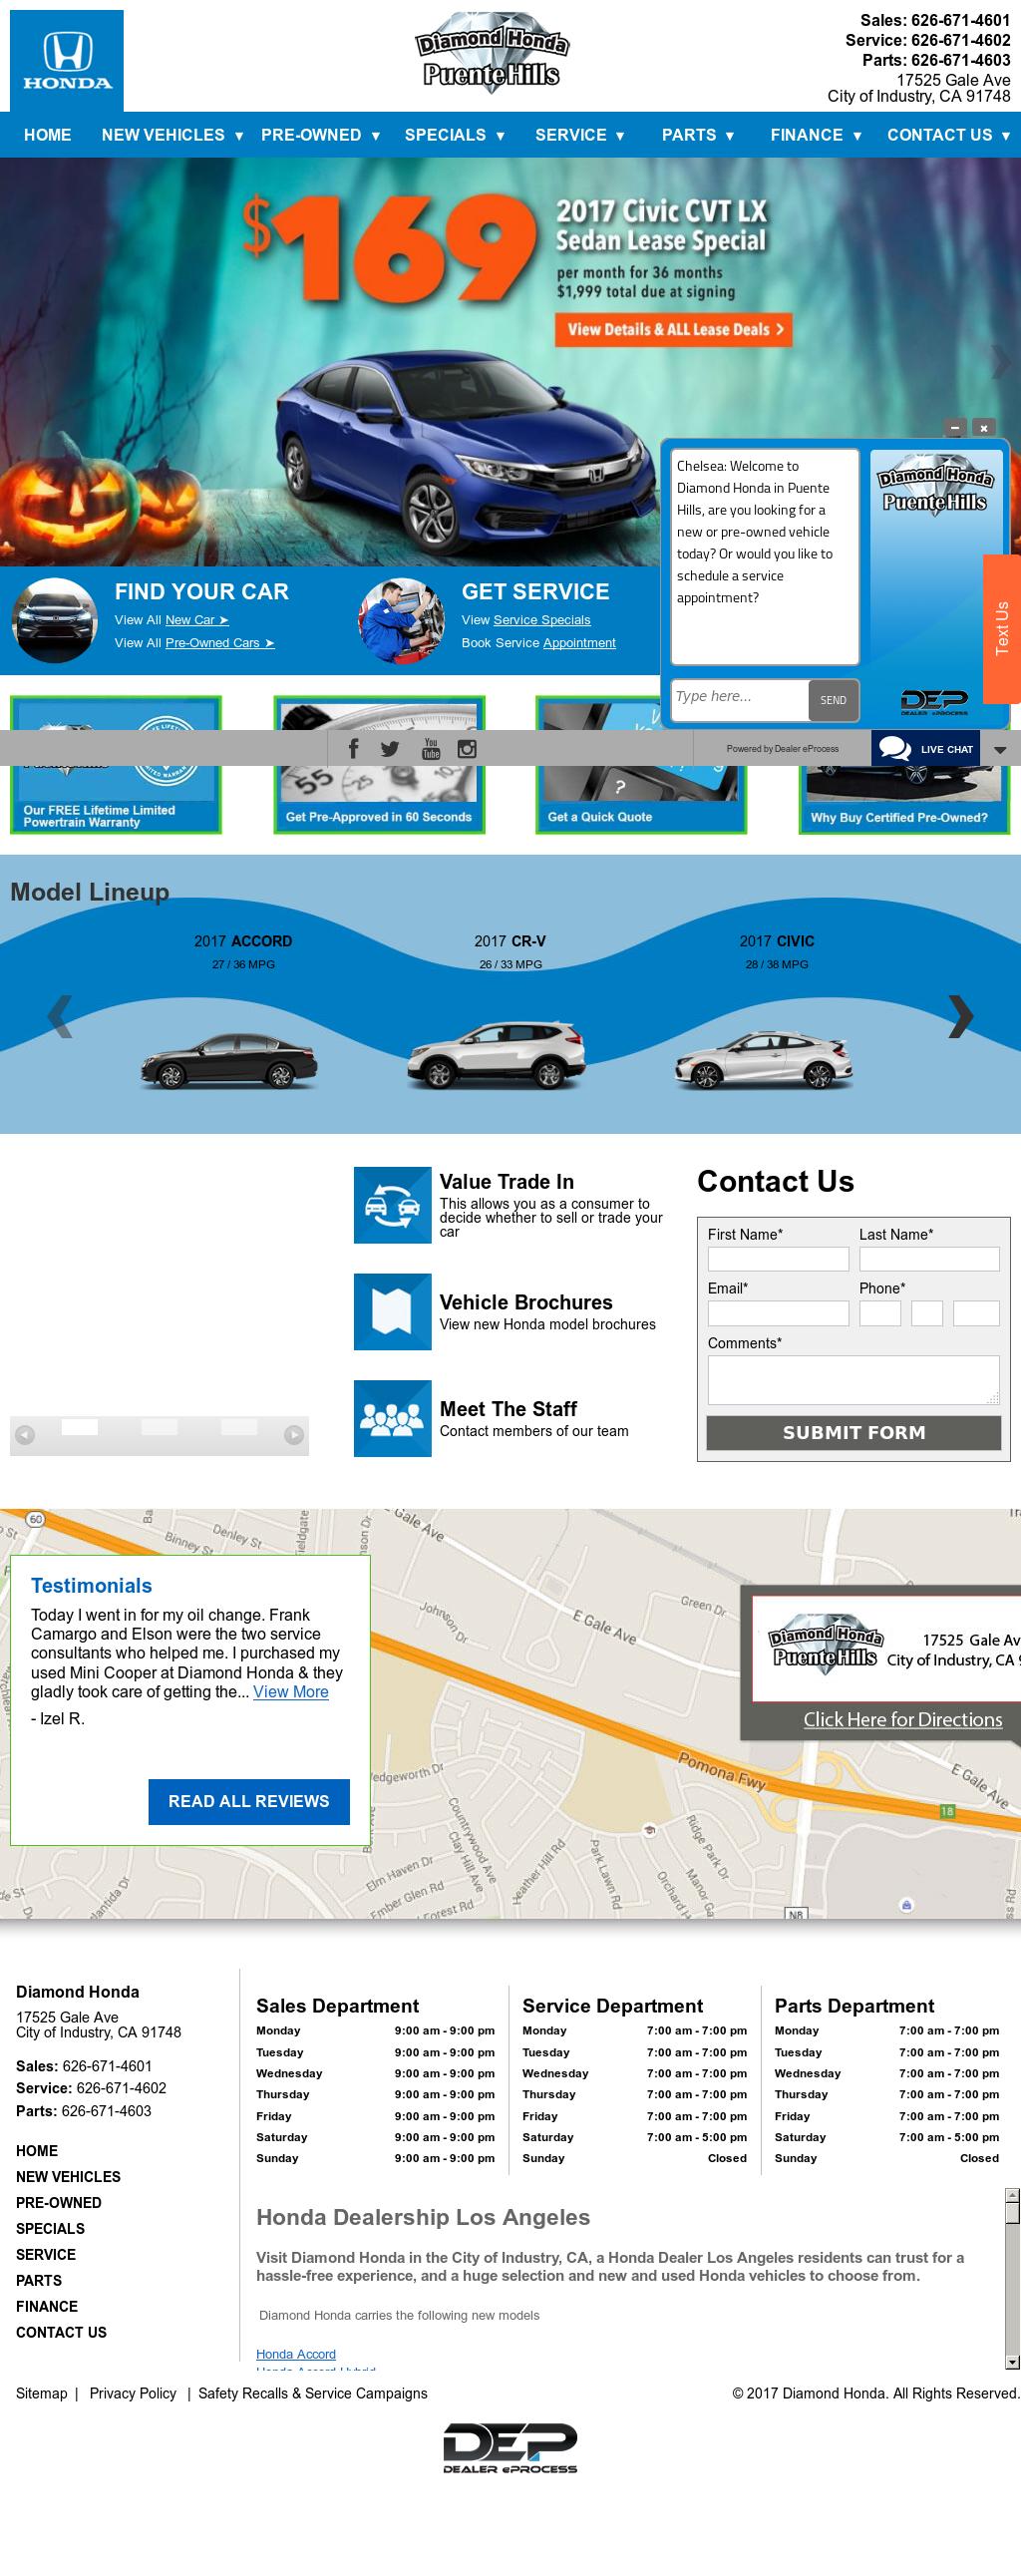 Puente Hills Honda >> Diamond Honda of Puente Hills Competitors, Revenue and Employees - Owler Company Profile